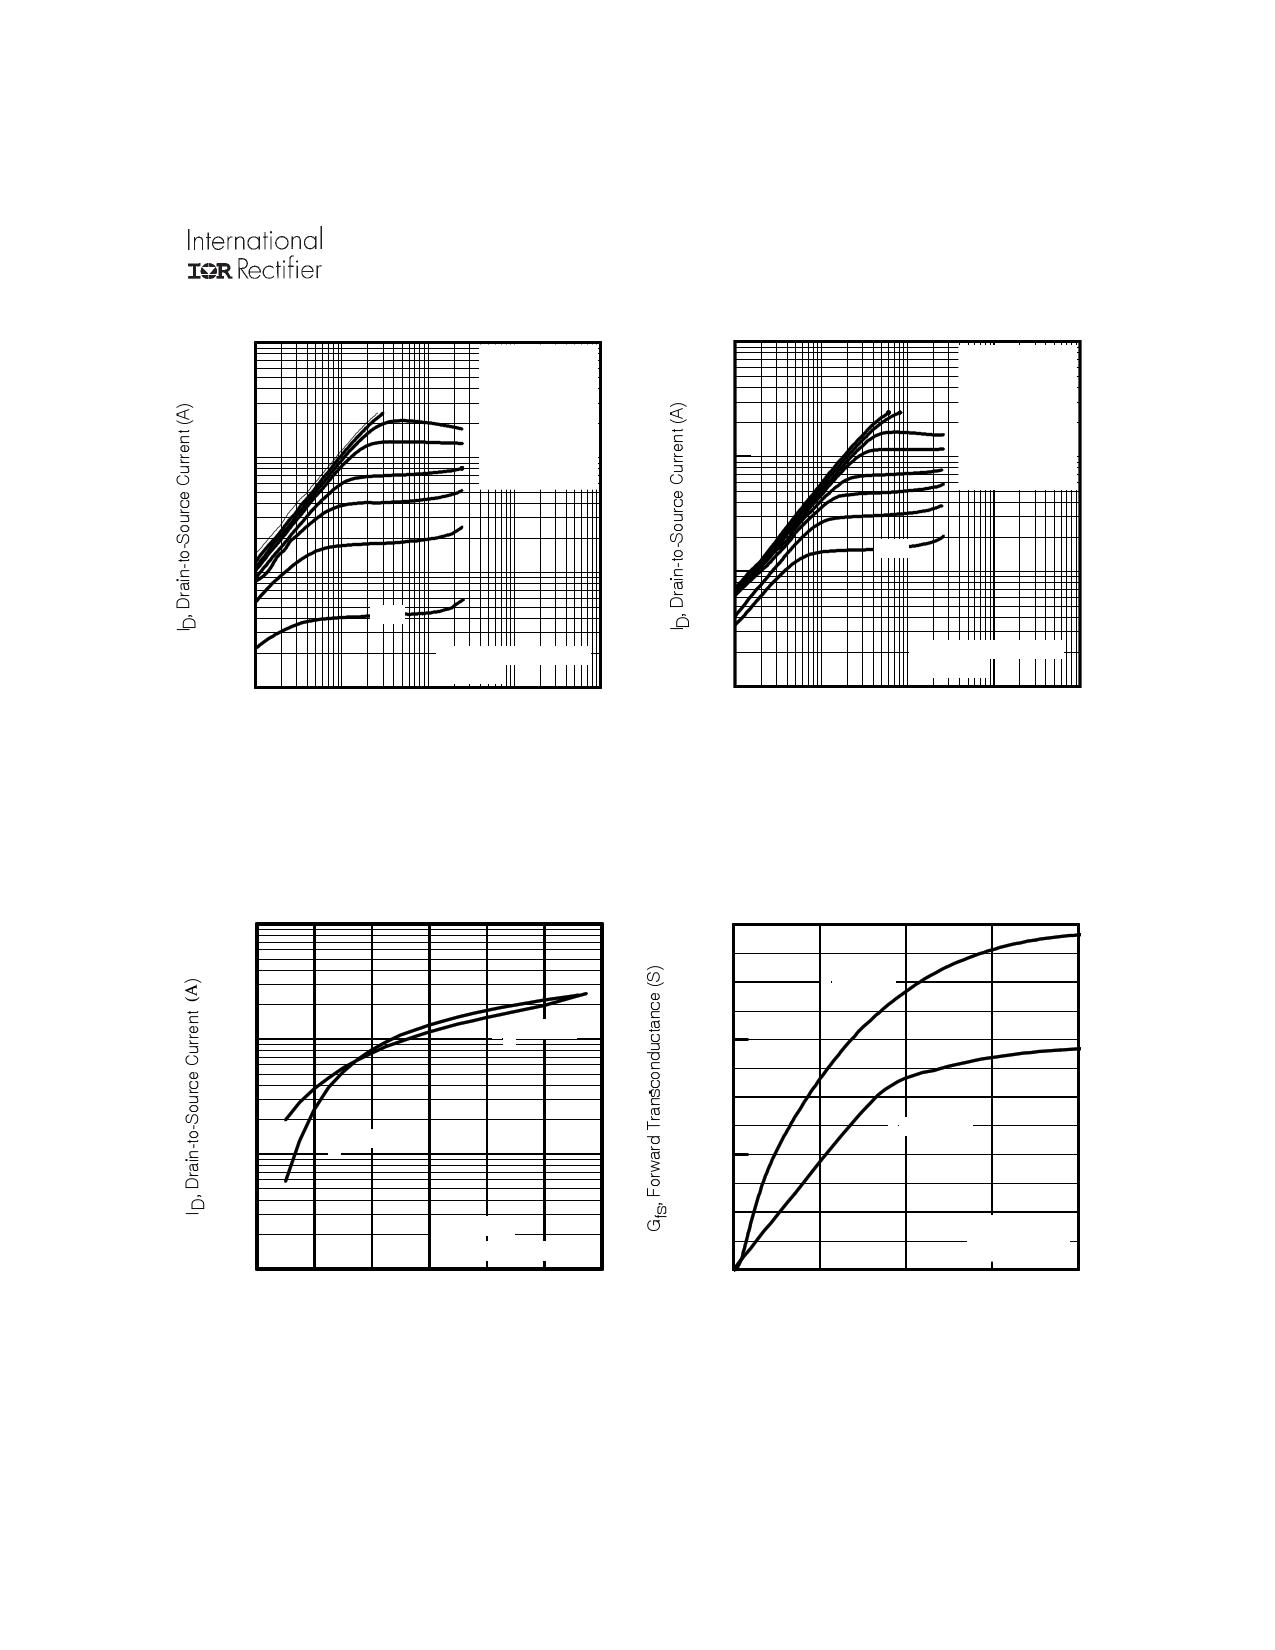 IRFZ48ZLPbF pdf, ピン配列